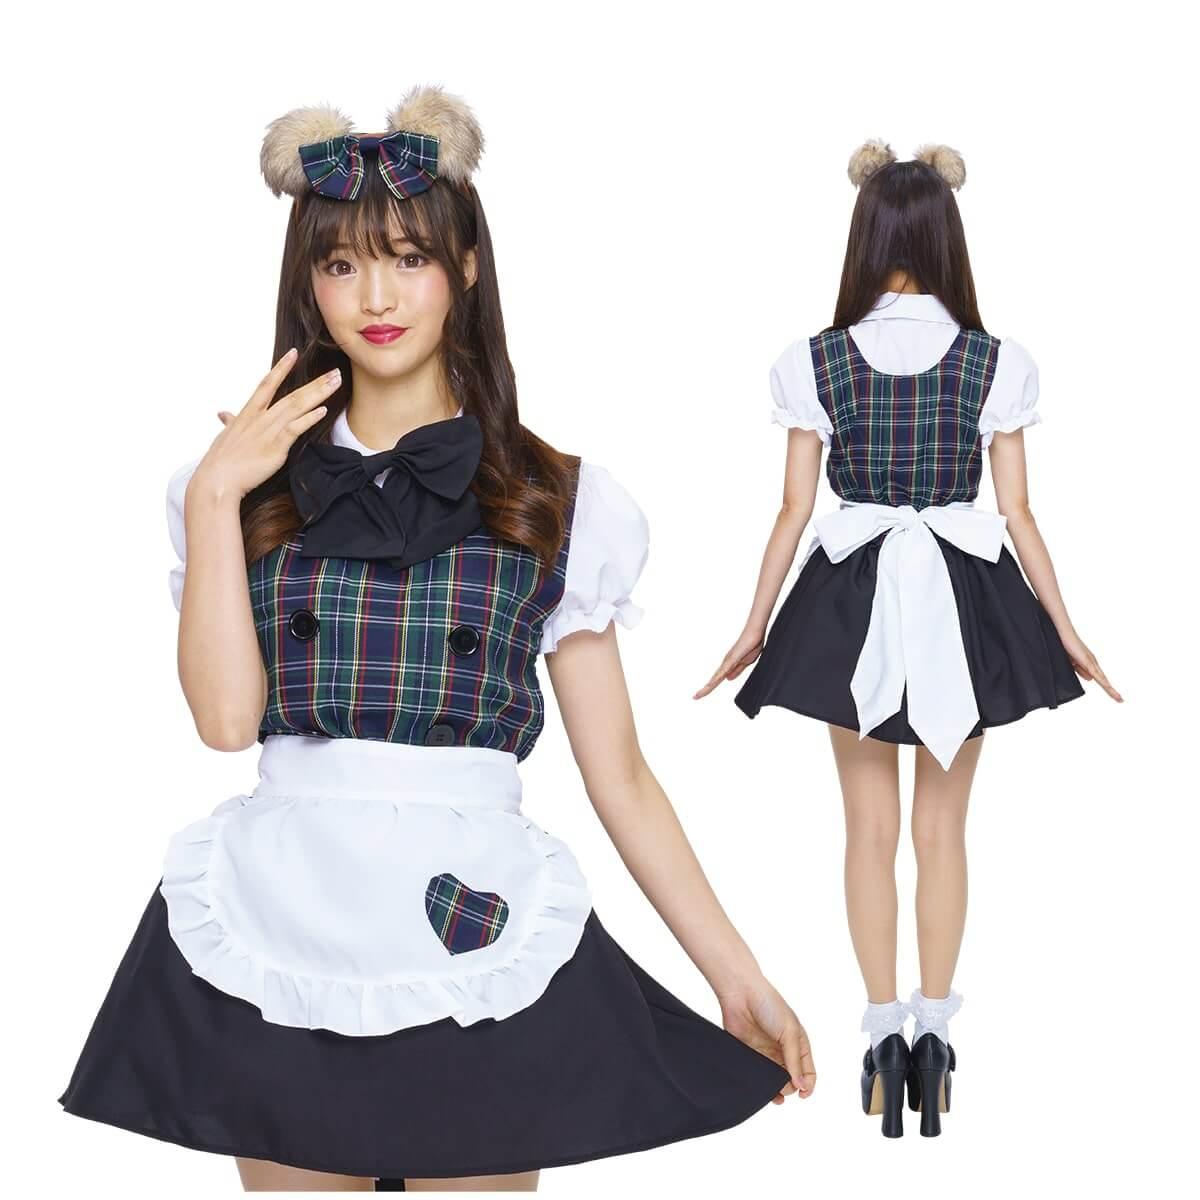 PUREネット通販で購入可能なクマさんの耳カチューシャ付きのチェック柄メイド服